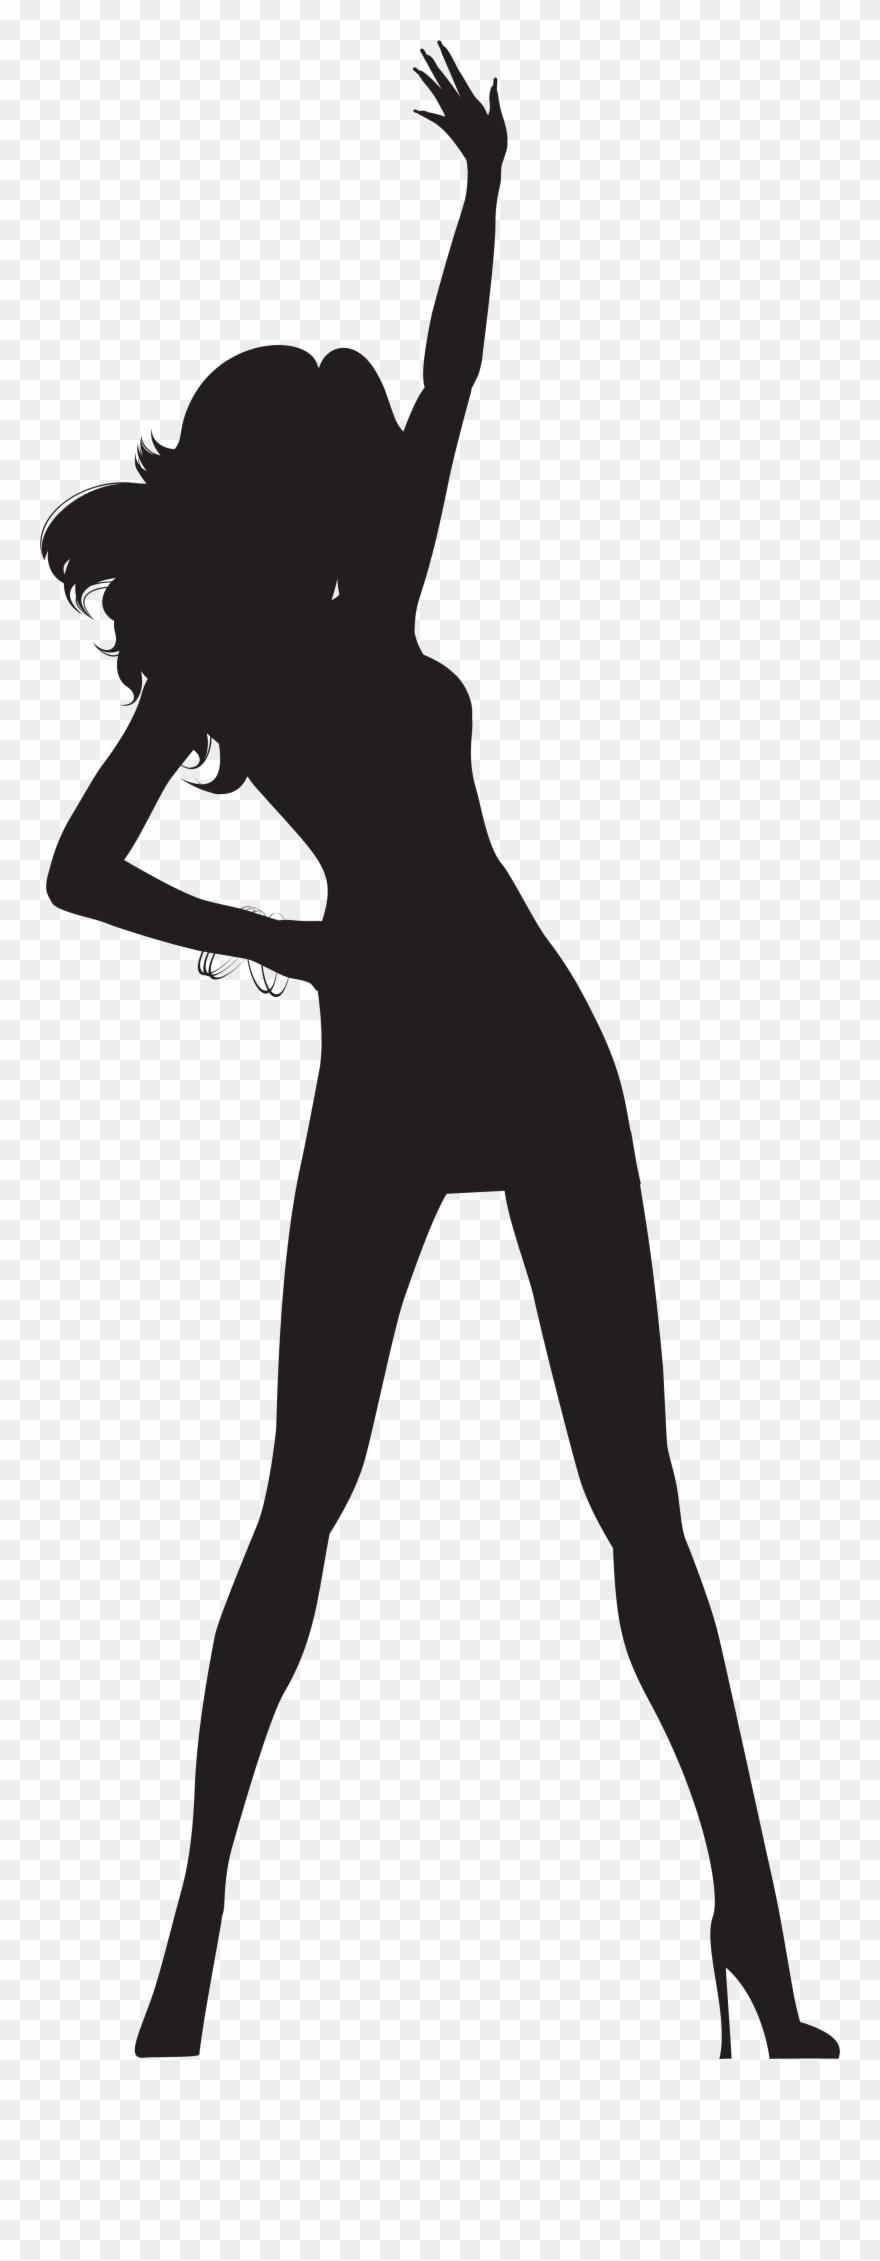 Dancing Woman Silhouette Png Transparent Clip Art Image.